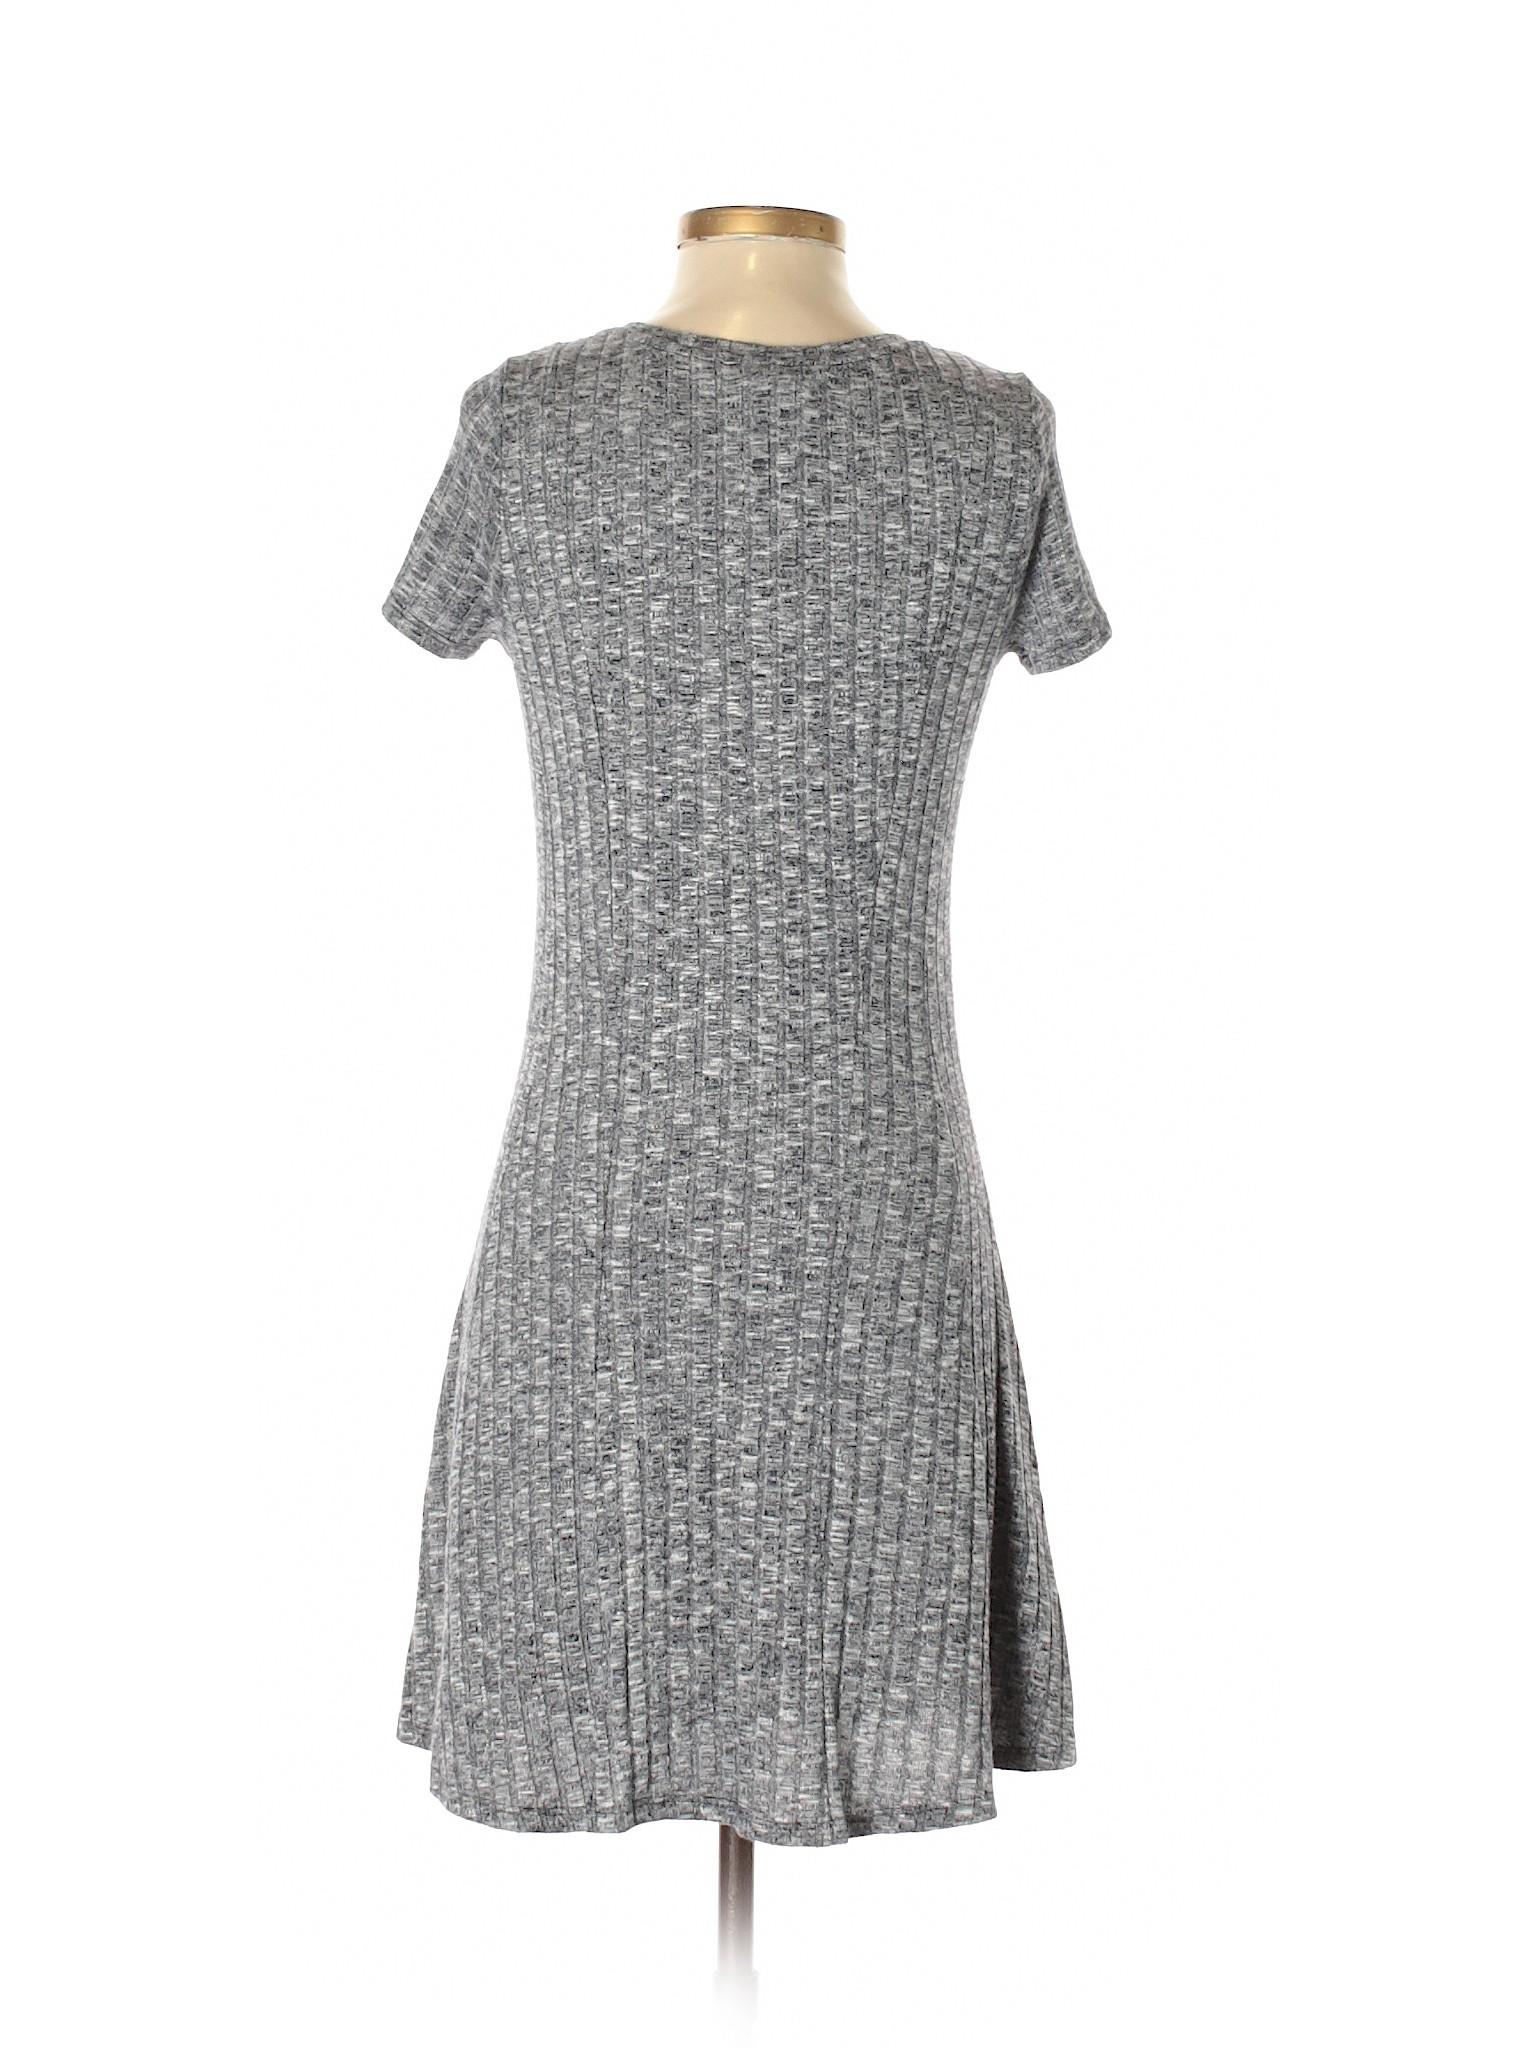 Casual Boutique Boutique winter Dolan Dolan Dress winter rZq1xcXEZw